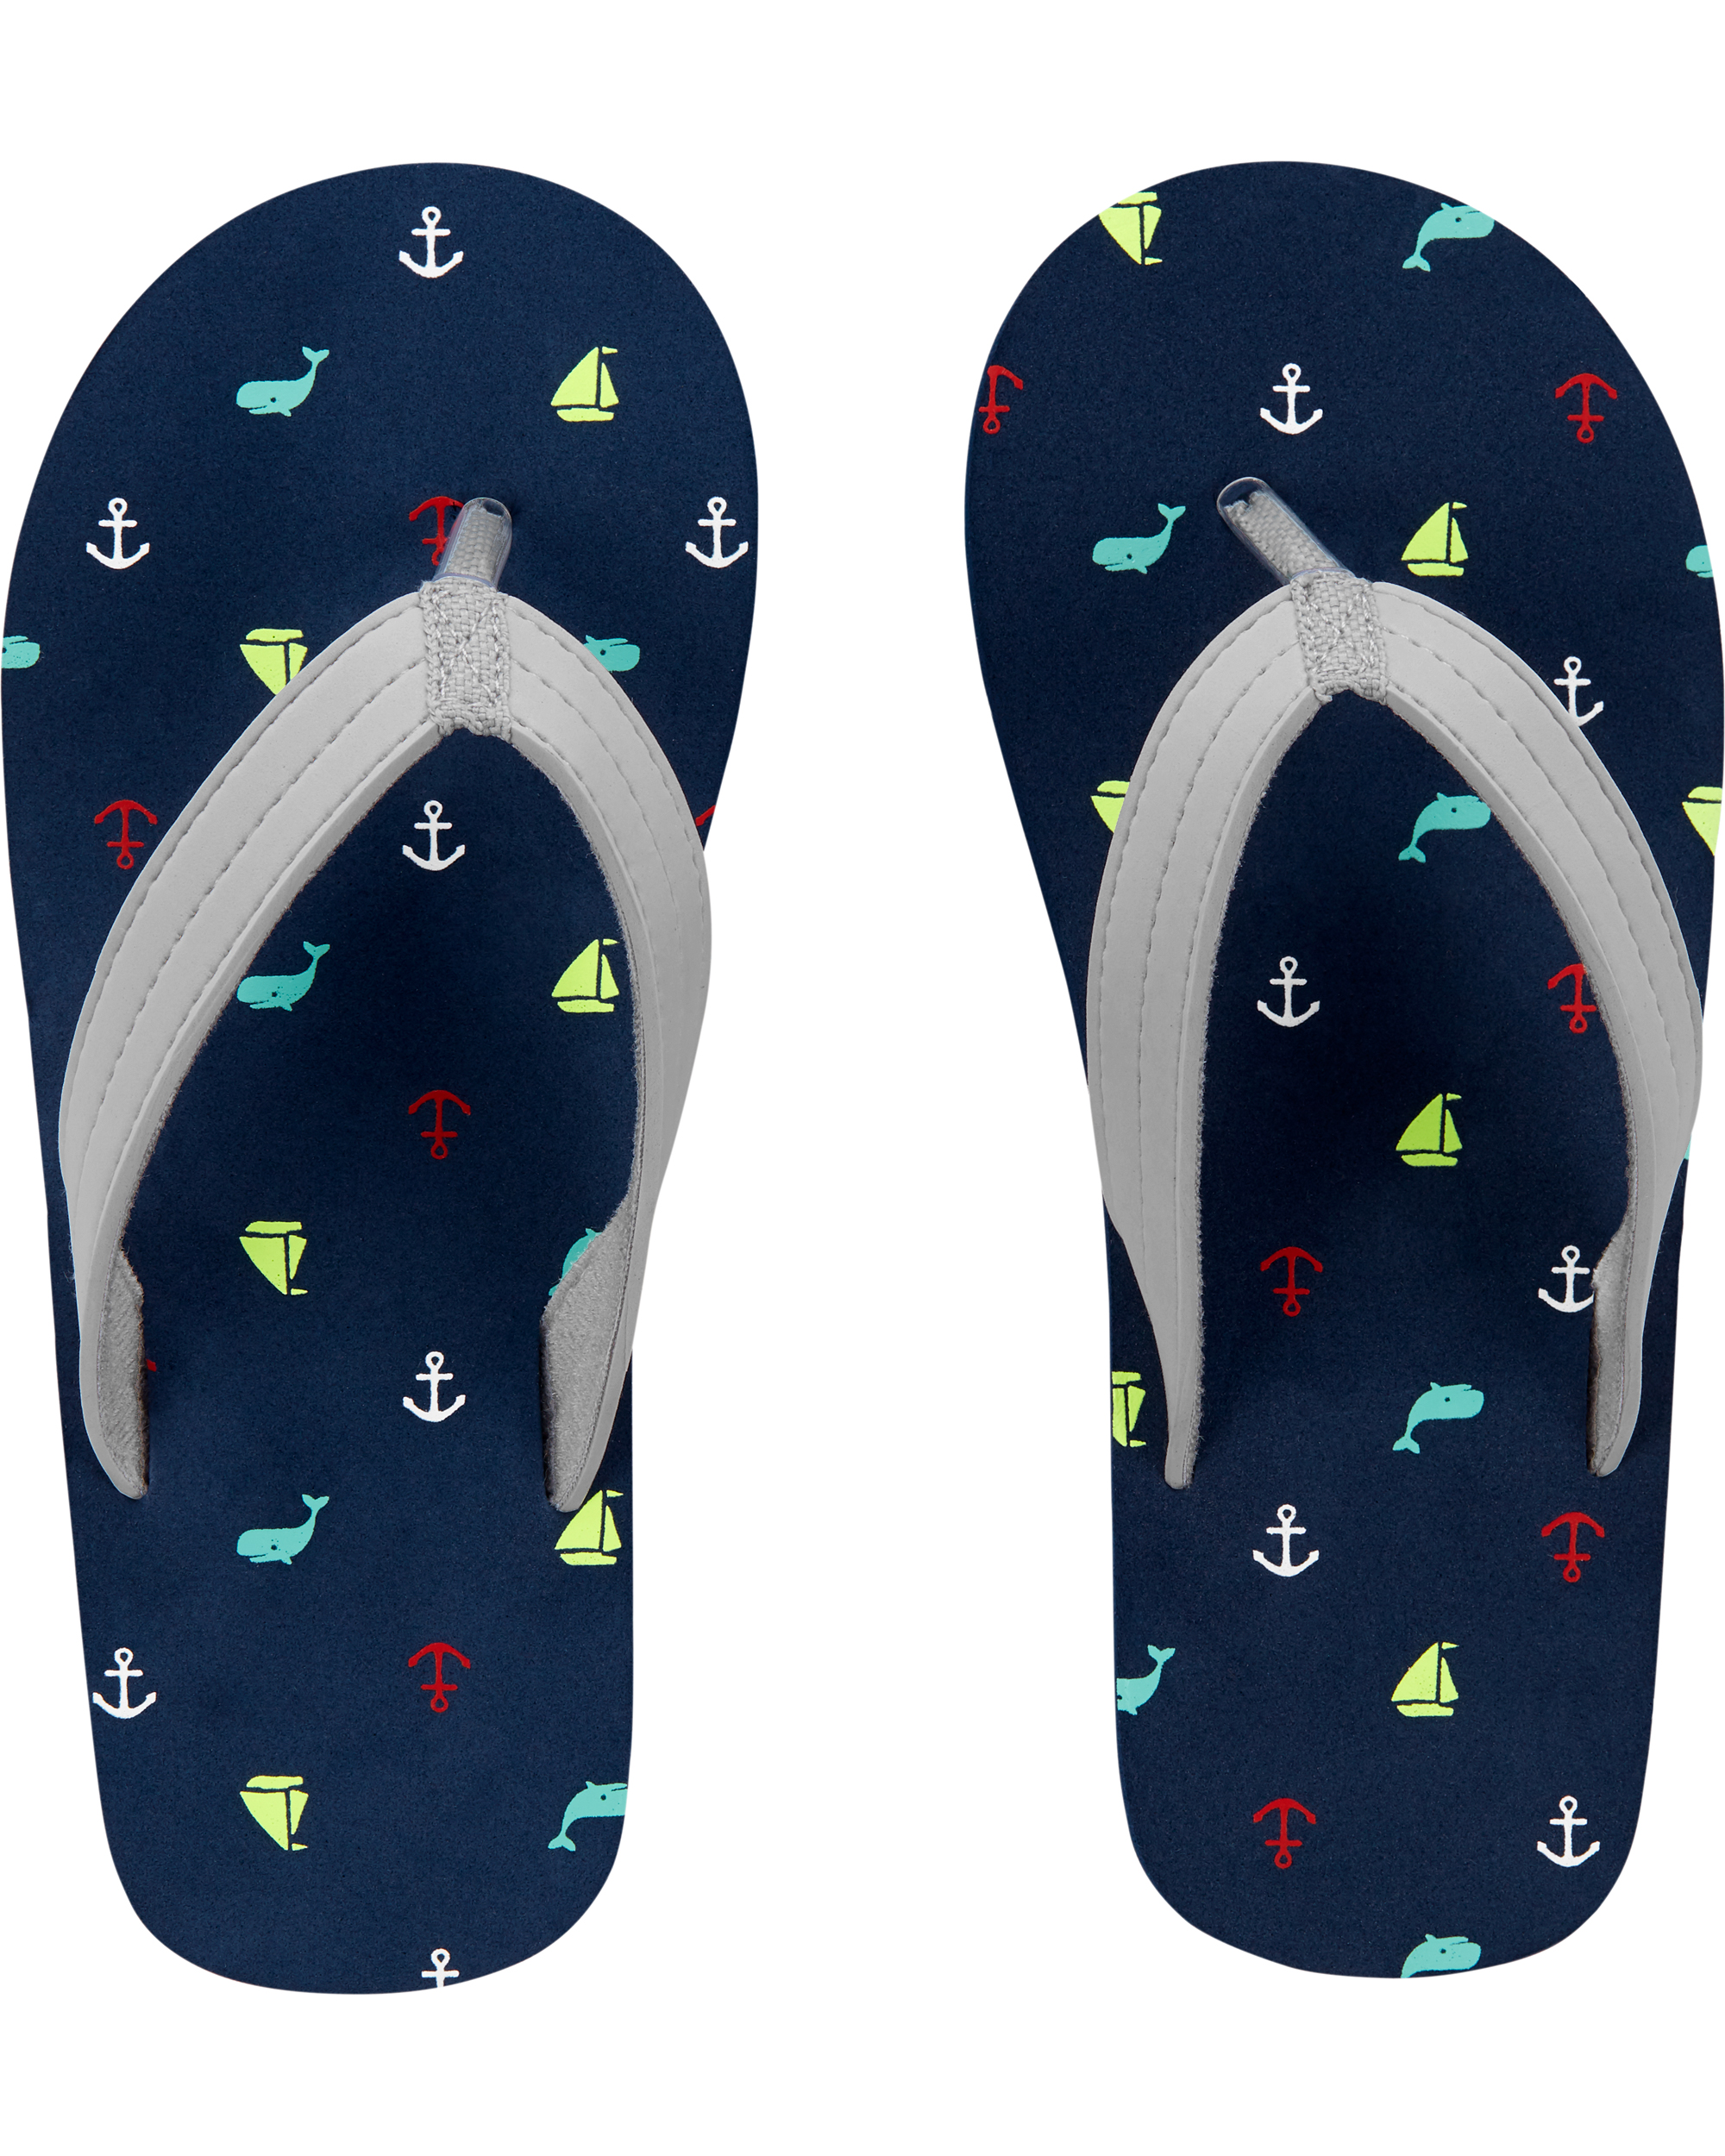 נעלי אצבע דפוס לויתנים